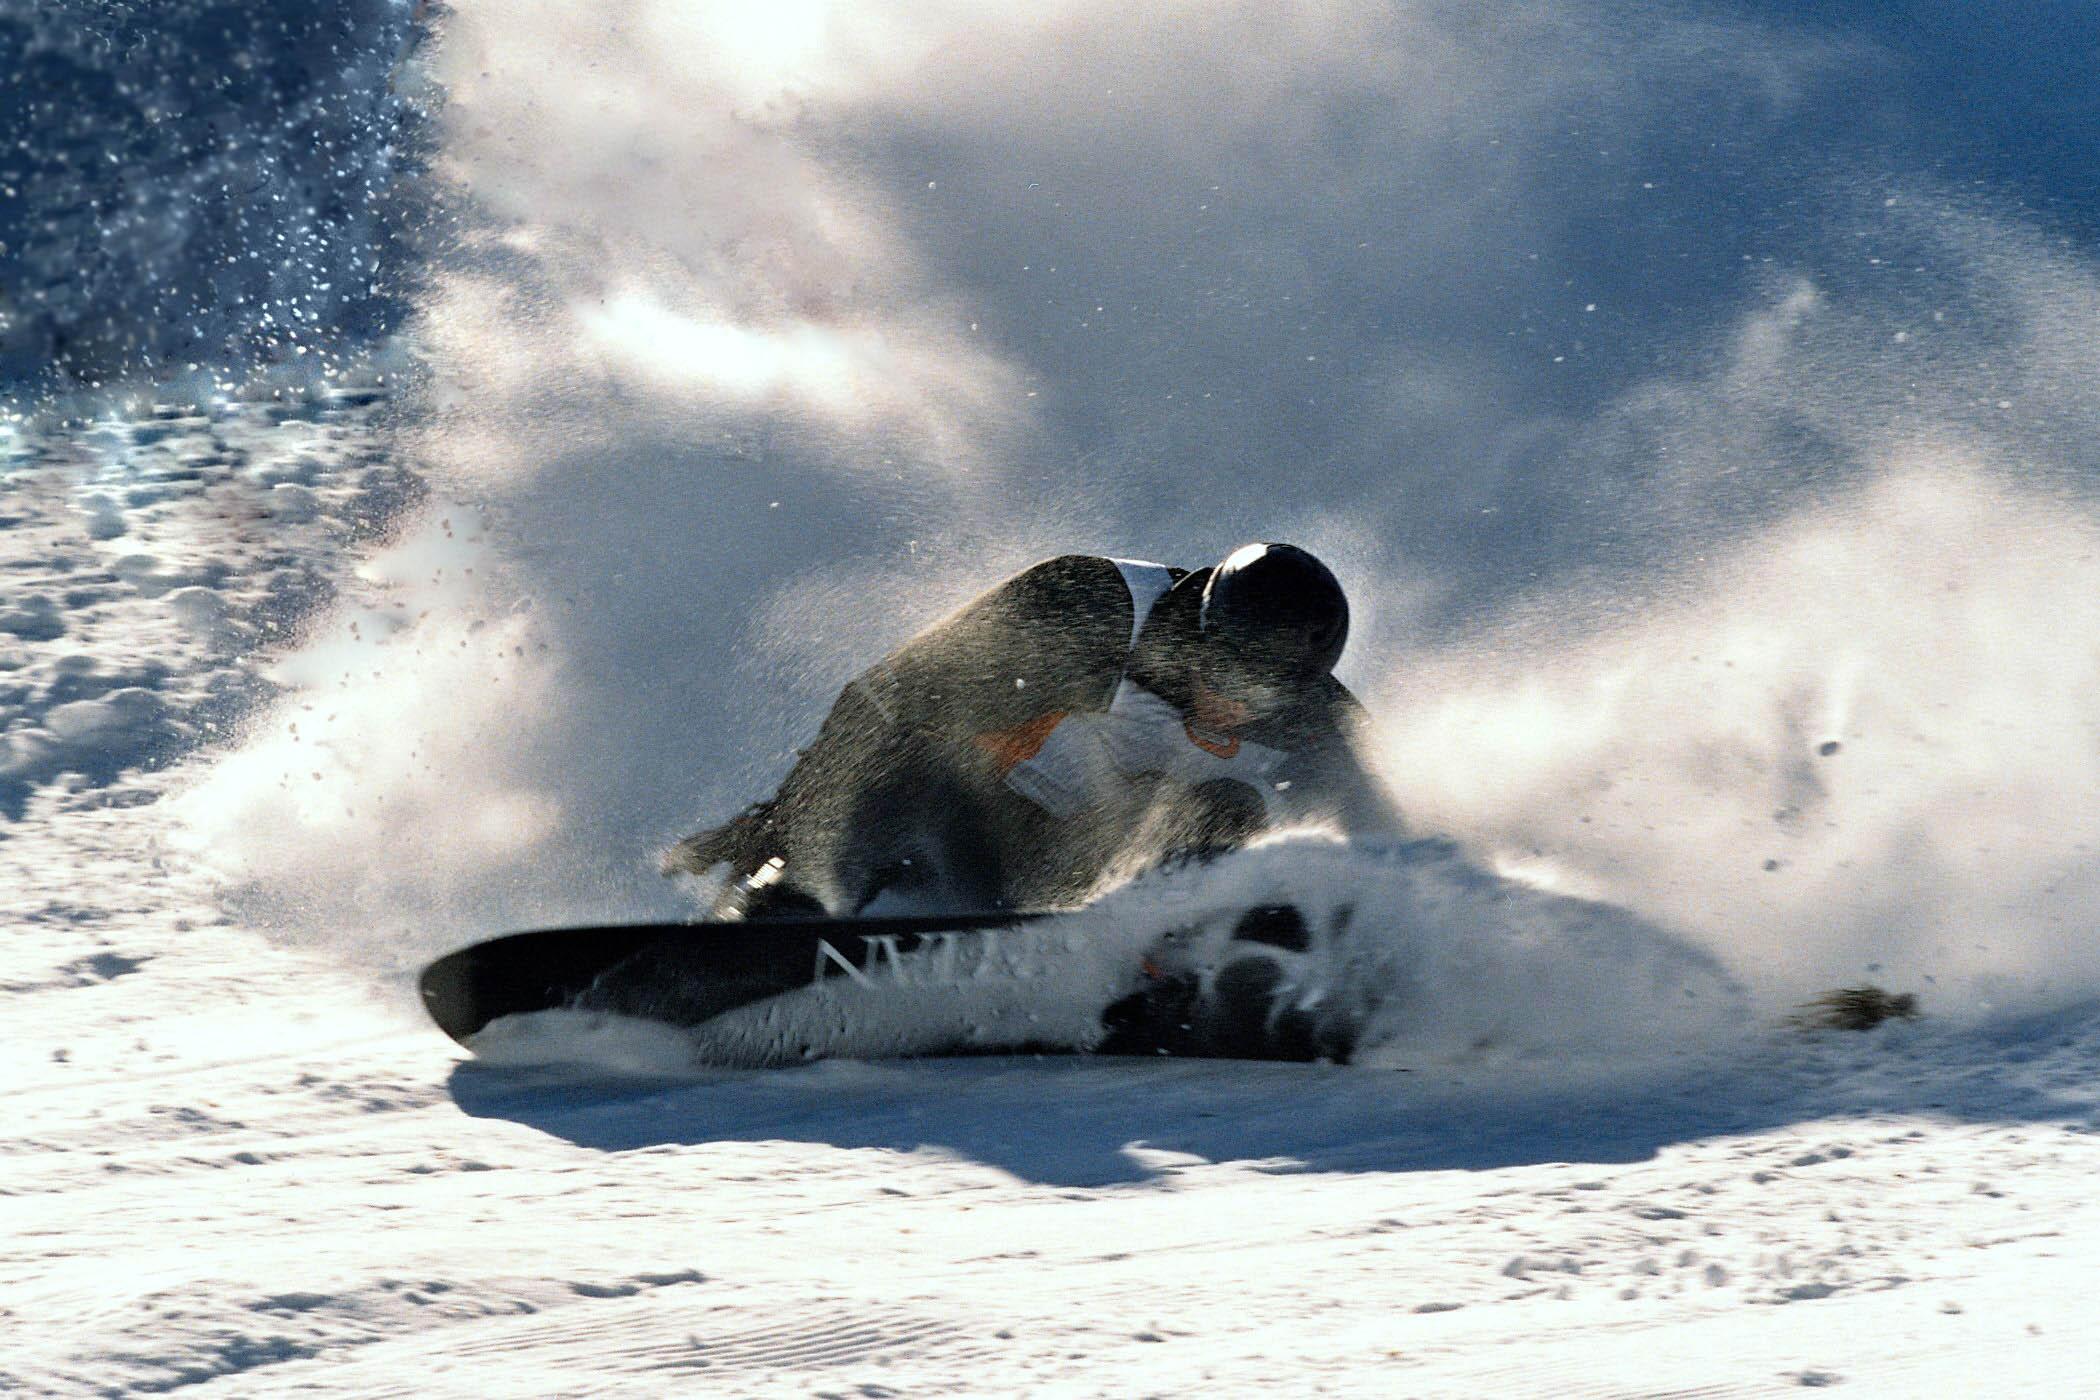 snowboarding wallpaper mobile hd - photo #24